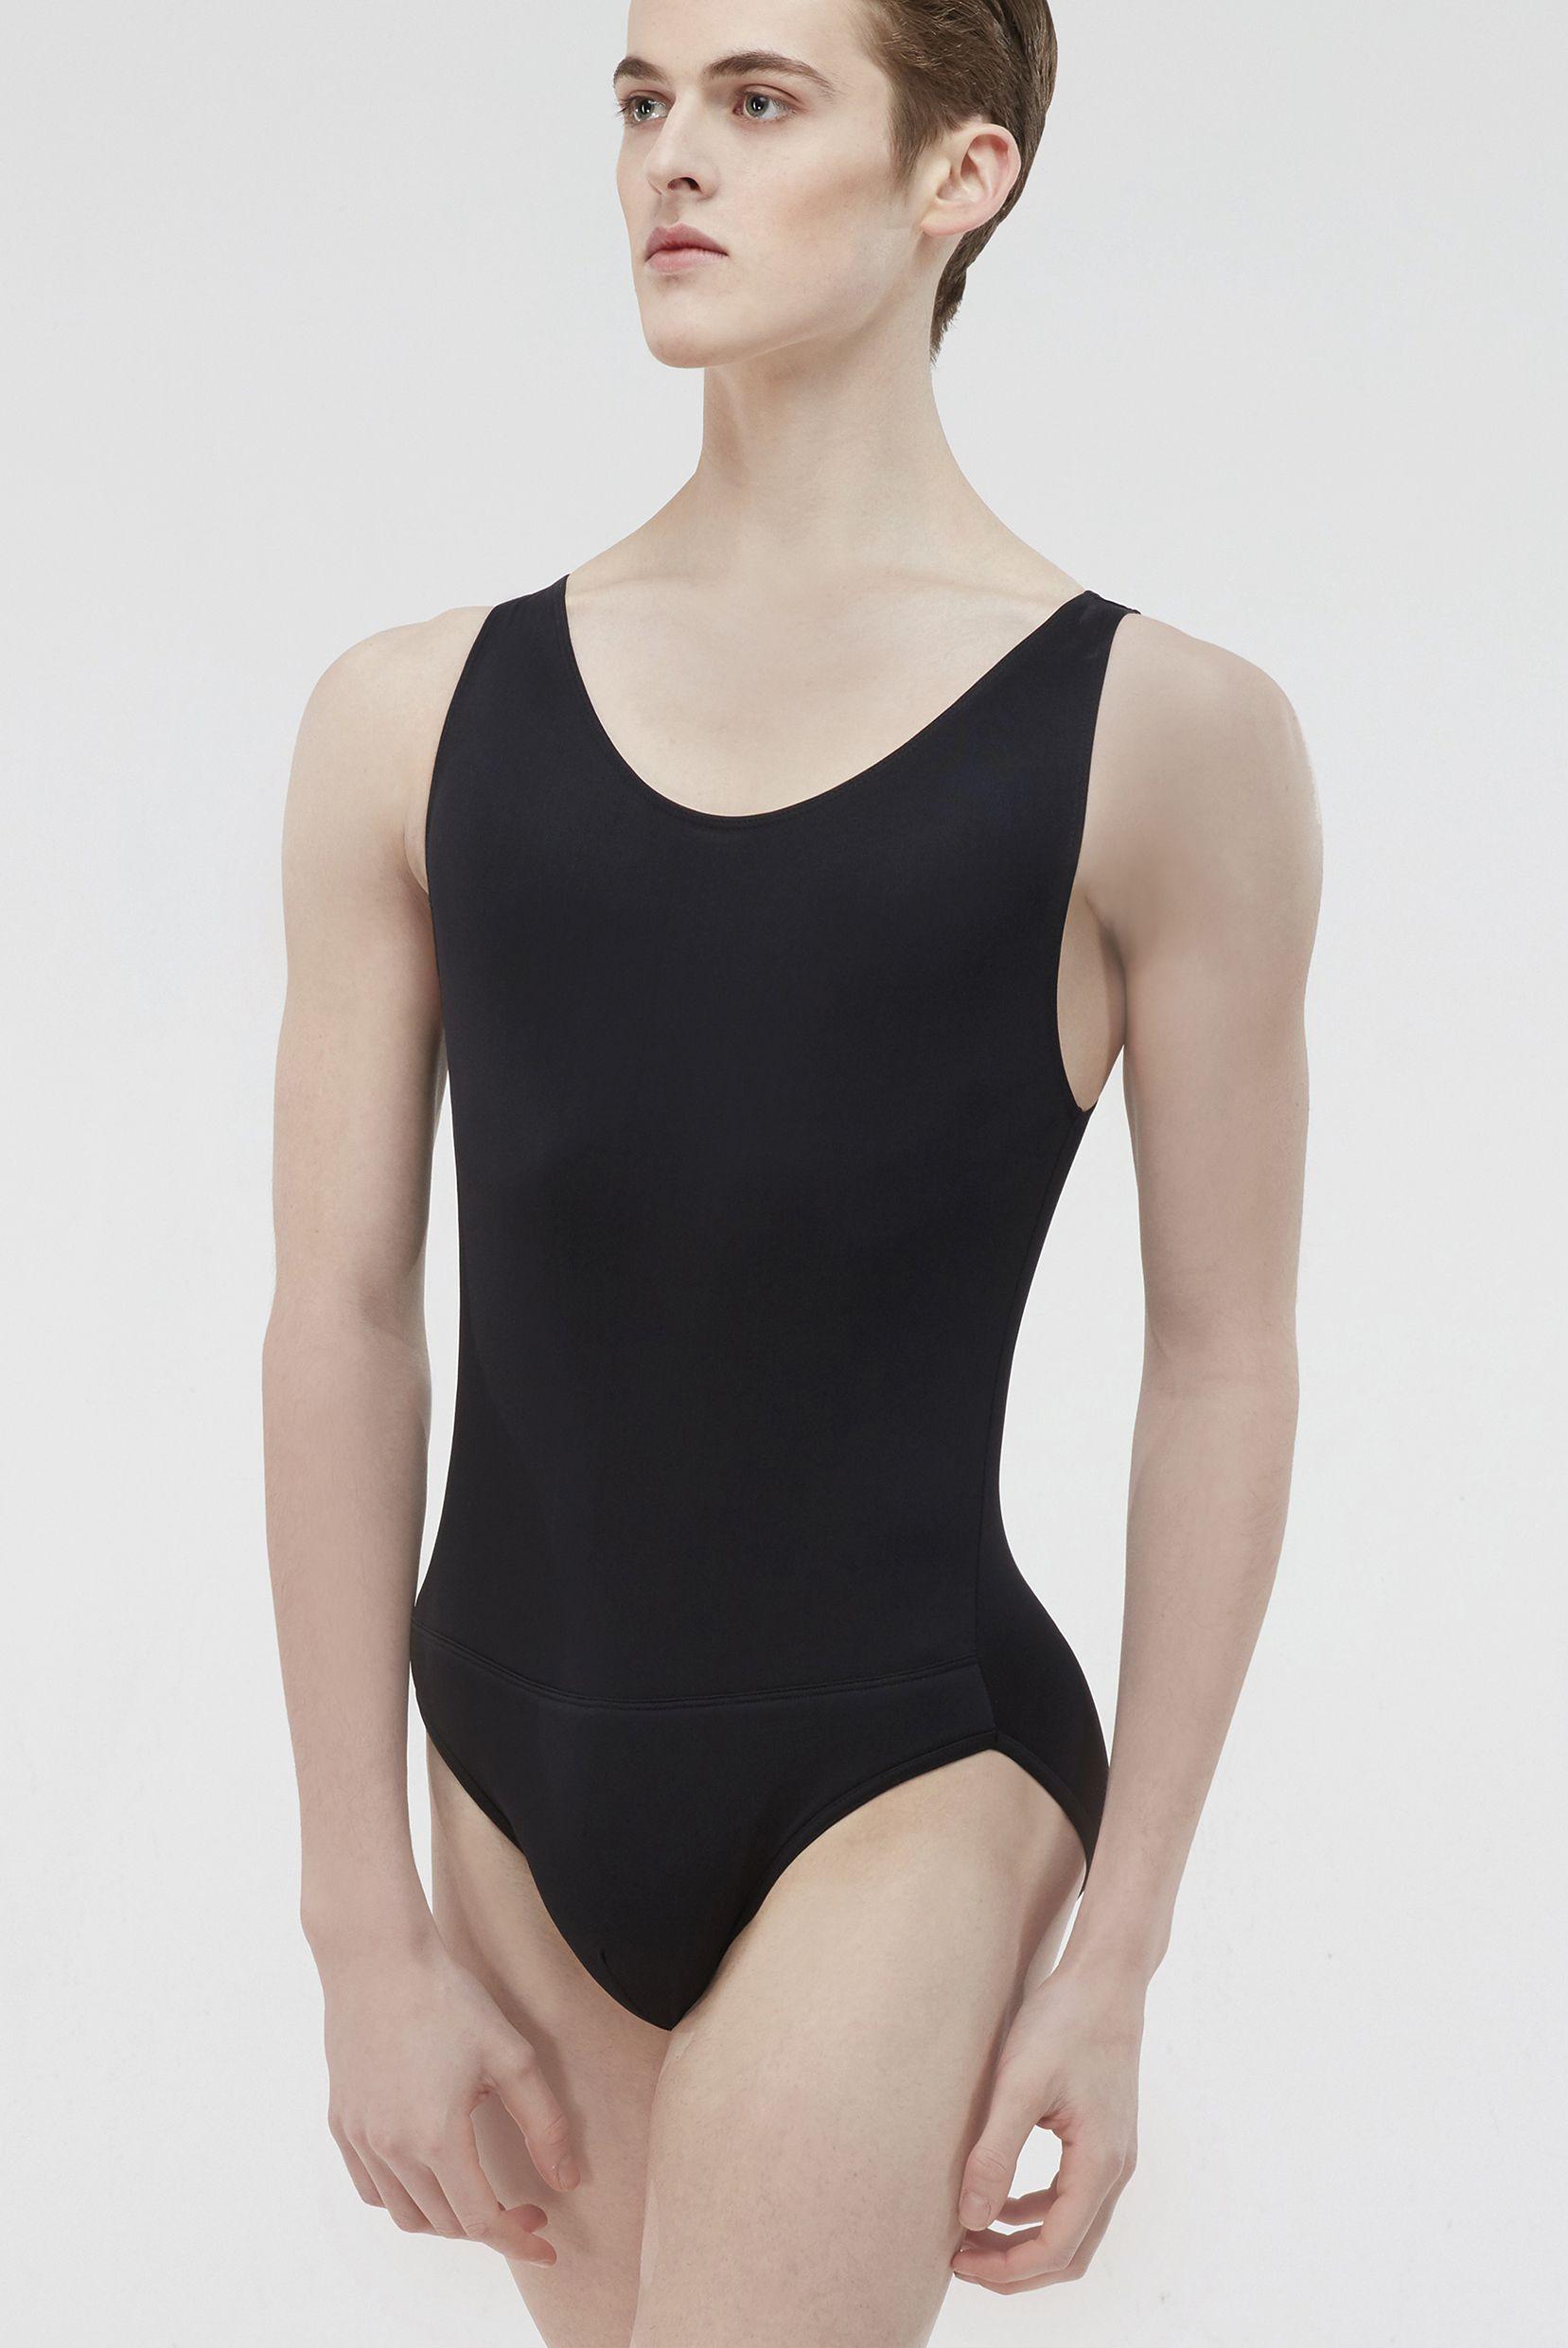 Octave Microfiber Basic Men S Full Tank Leotard With Attached Full Seat Dance Belt Wearmoi Ballet Ballet M Dance Bodysuits Leotard Fashion Ballet Clothes